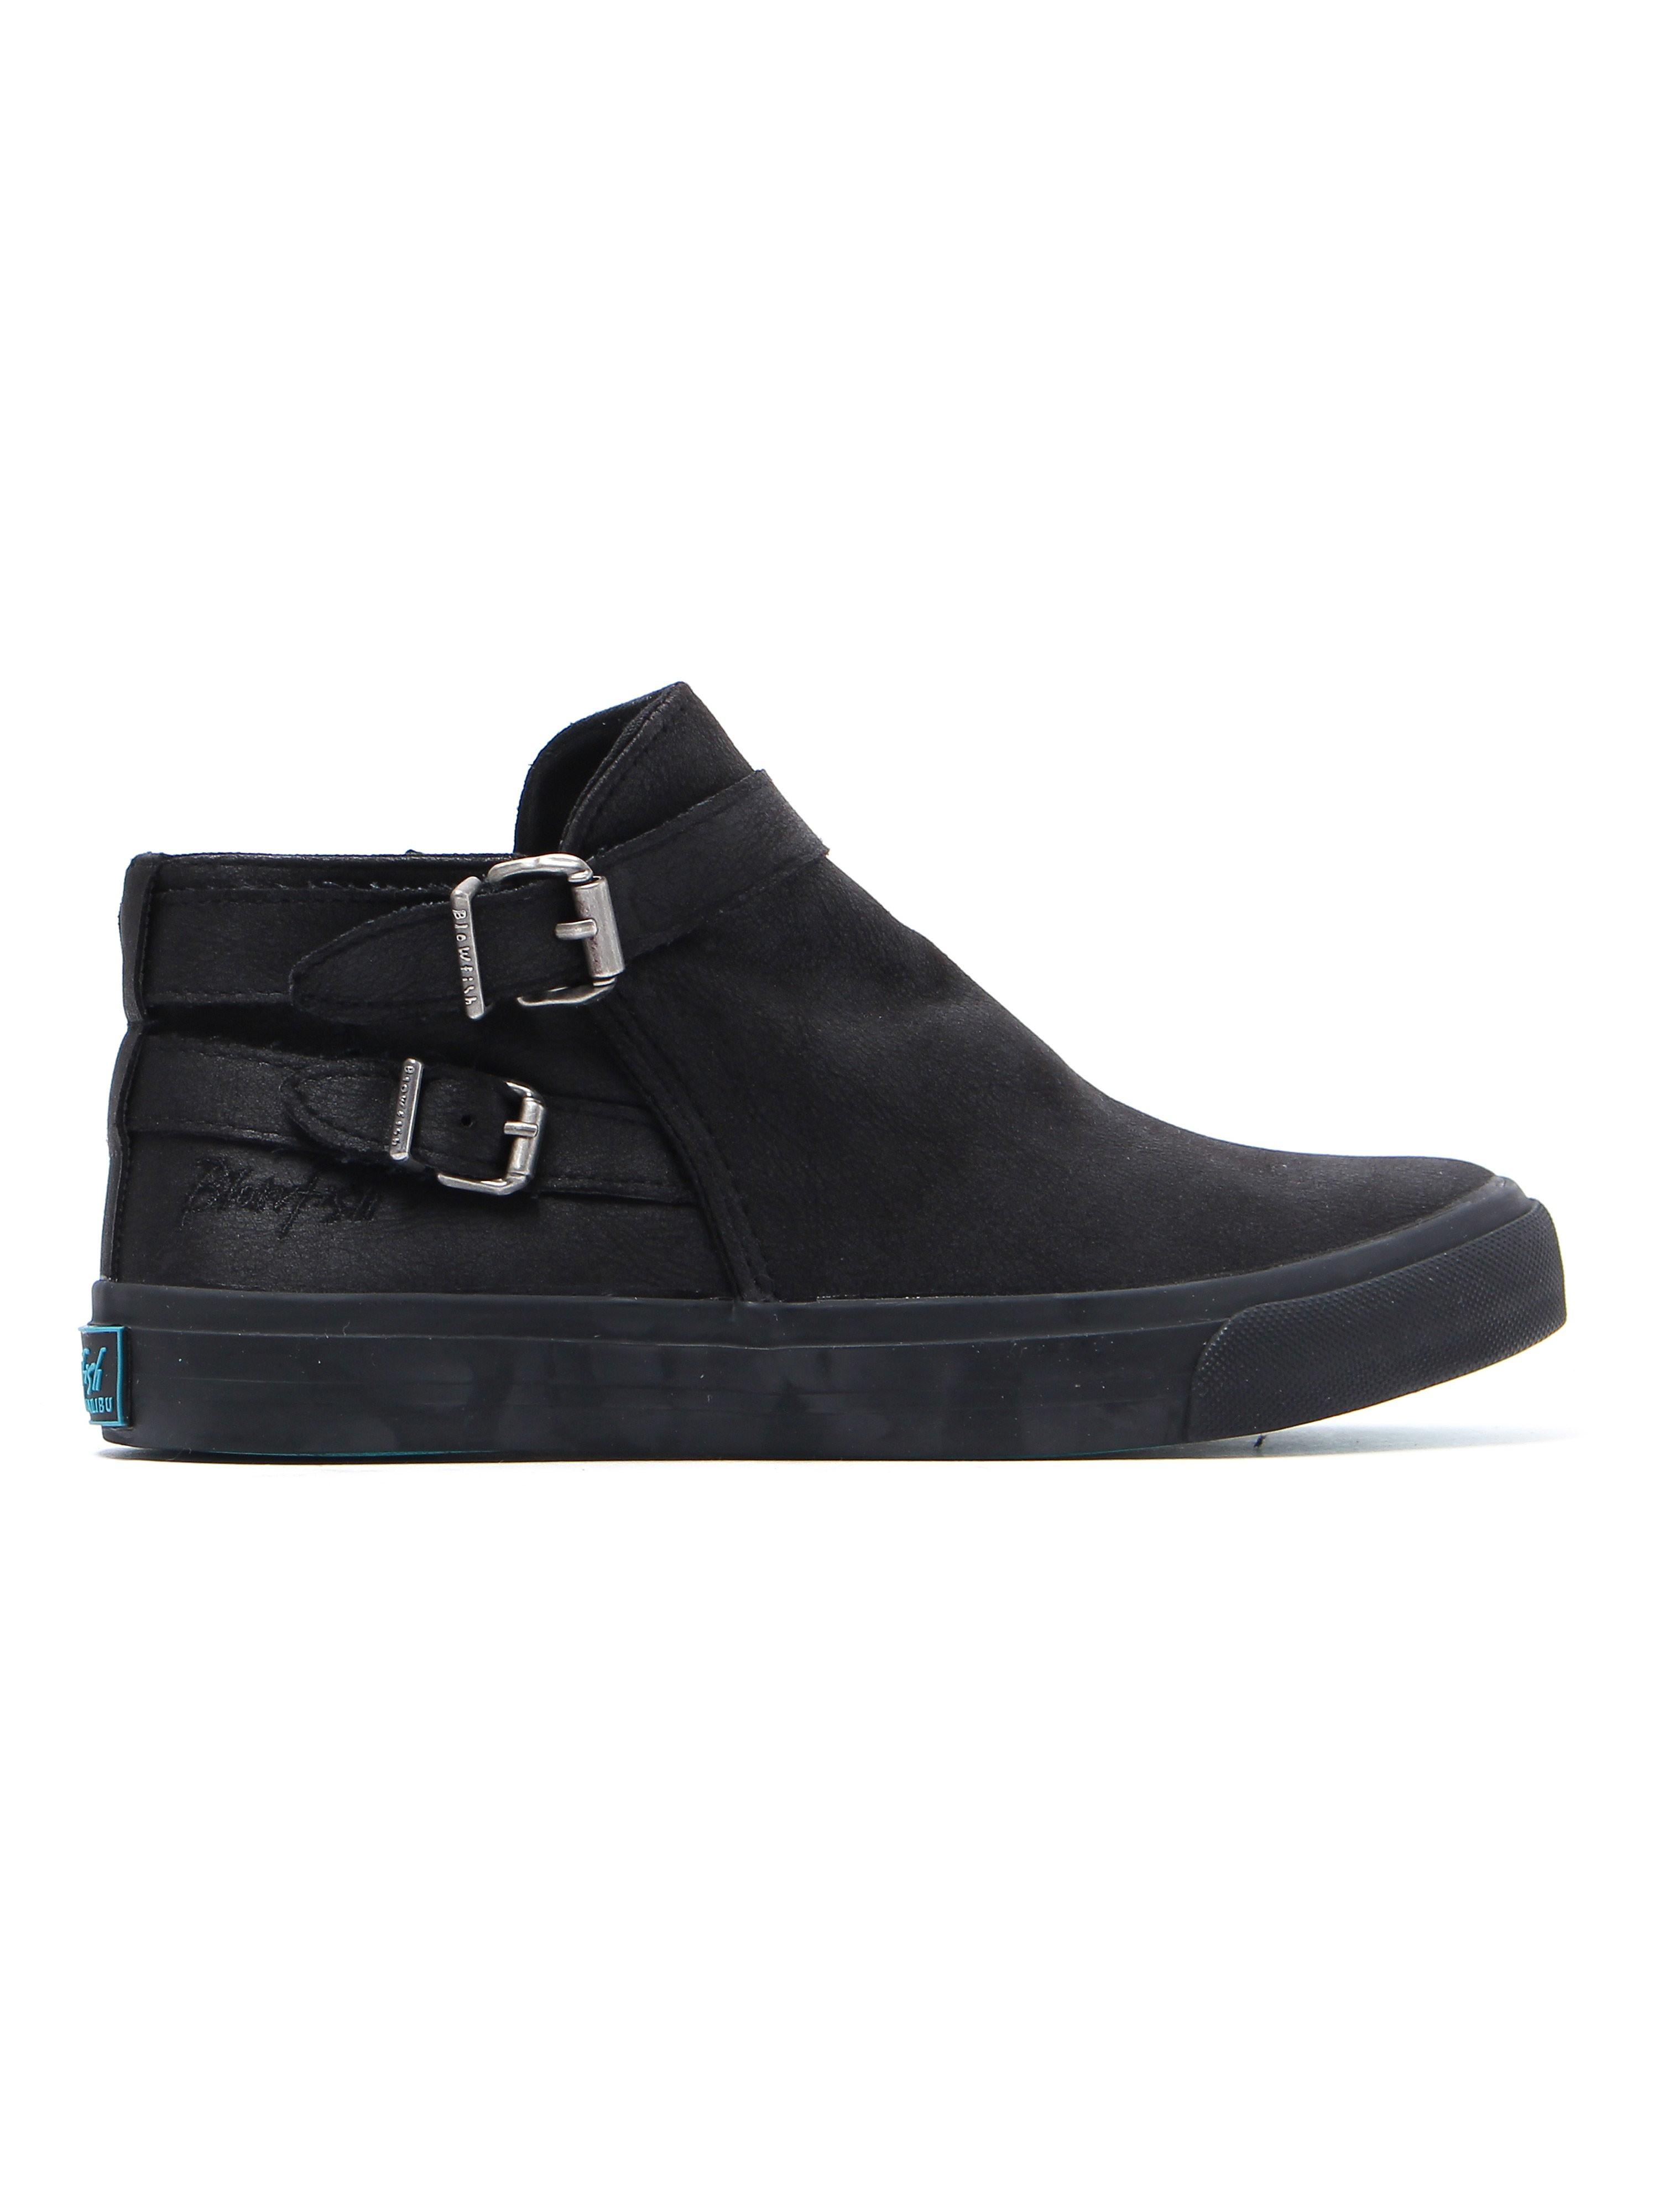 Blowfish Women's Monroe Ankle Boots - Black